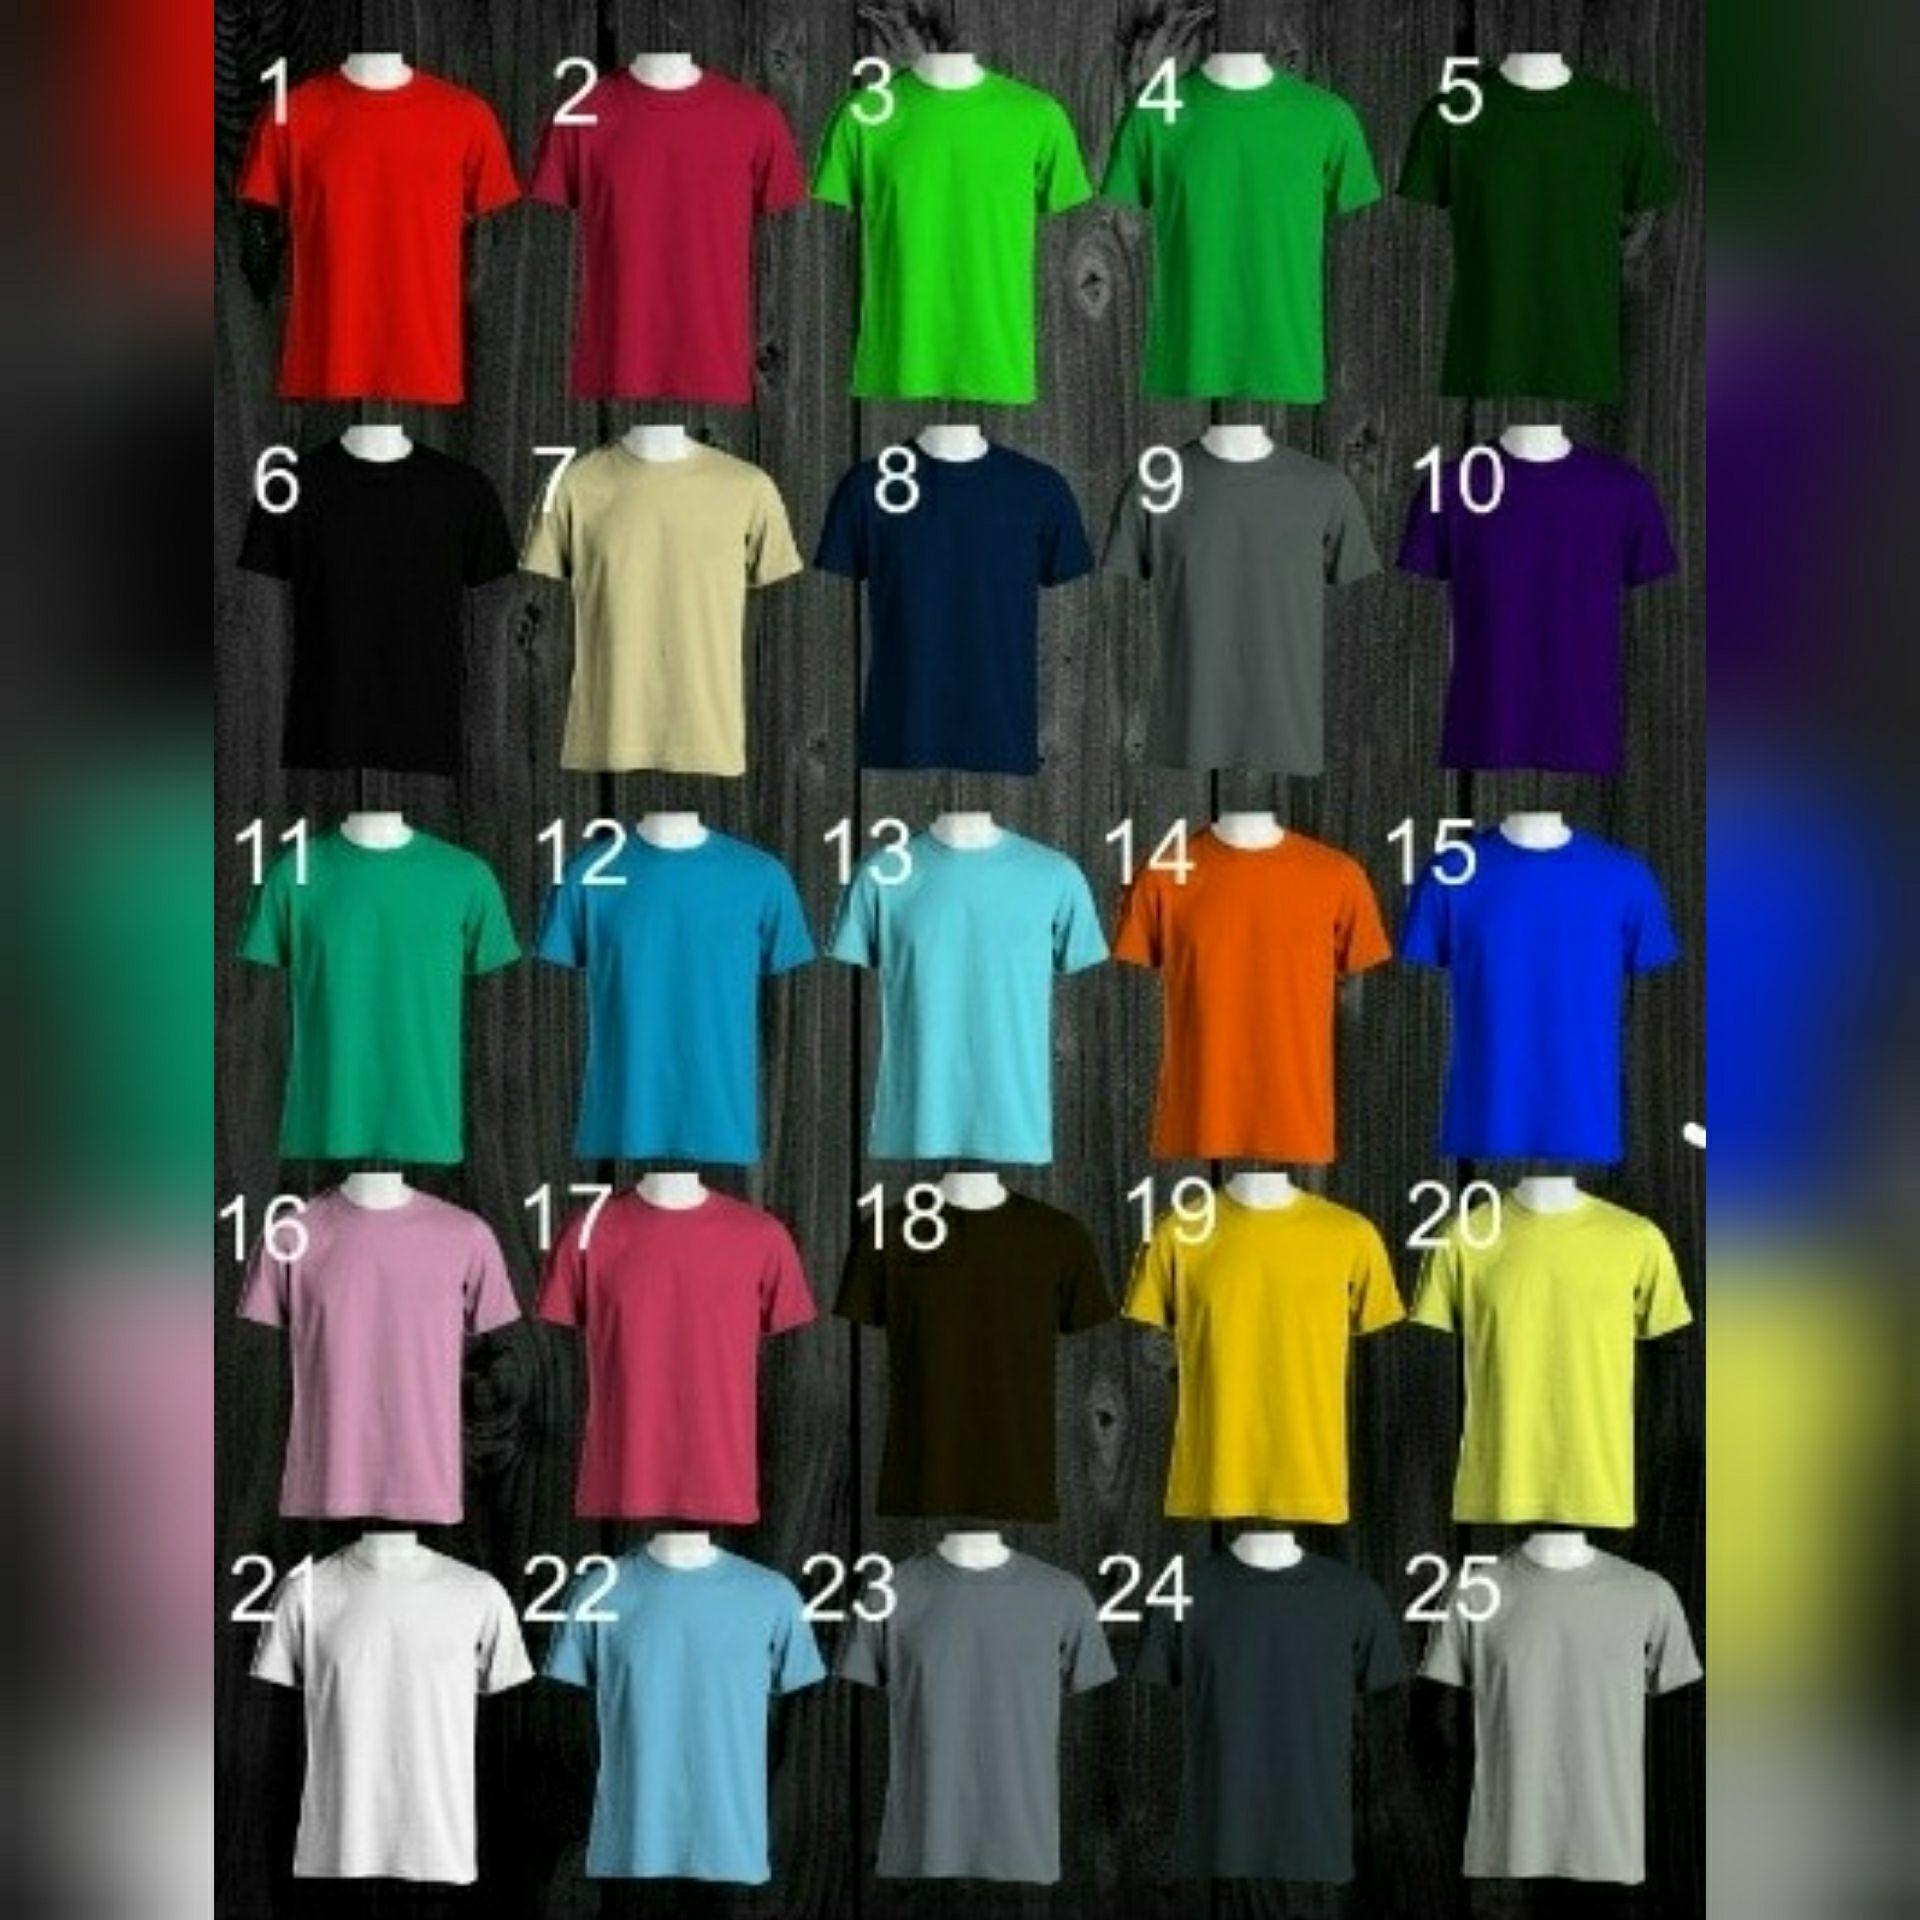 Daftar Harga Kaos Polos Cotton Combed 30s Termurah Coklat Pria 100